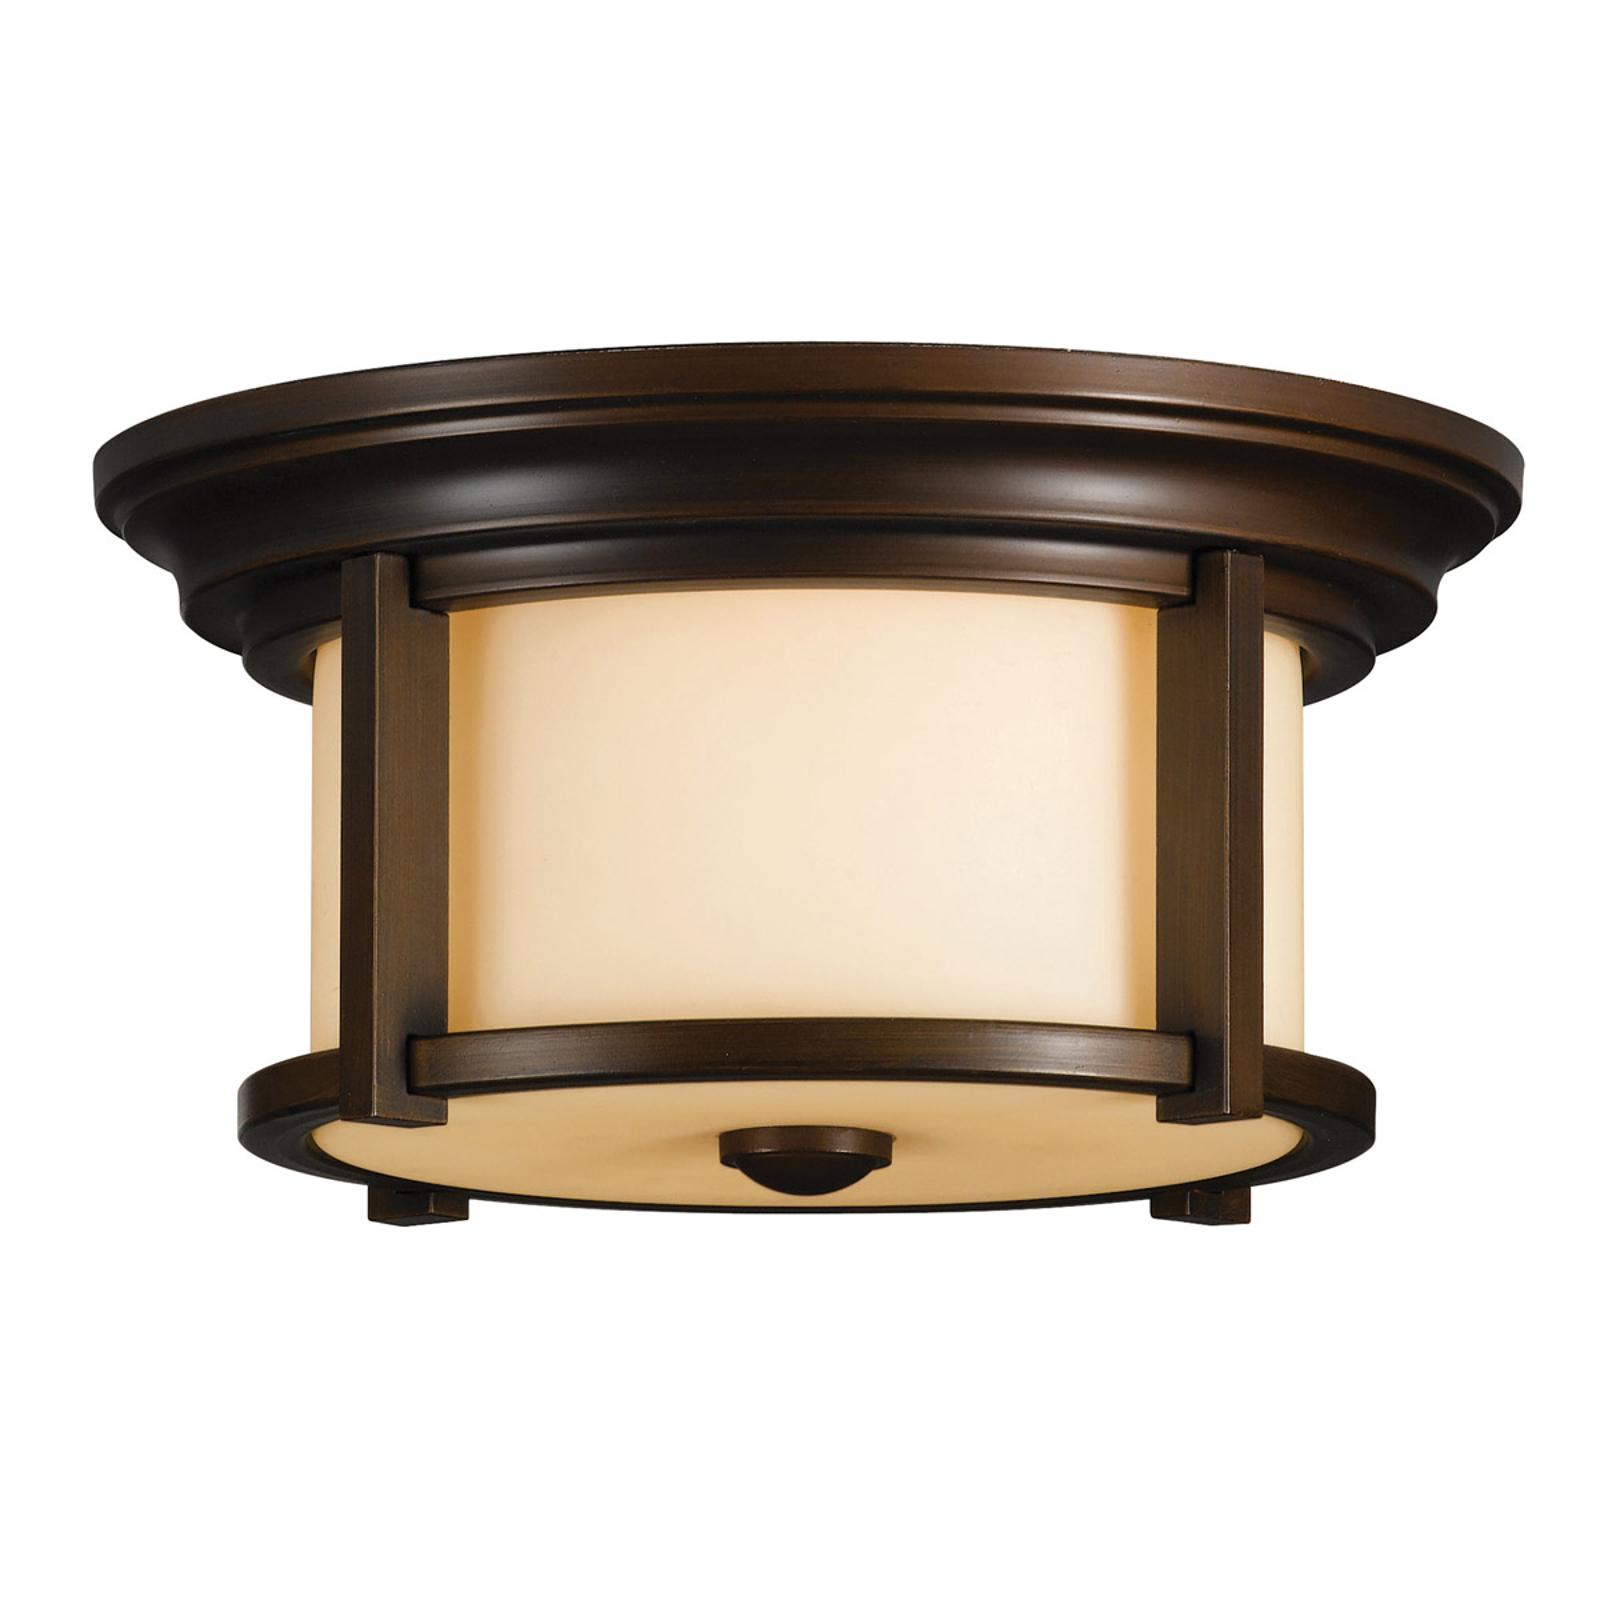 Buiten plafondlamp Merrill in brons